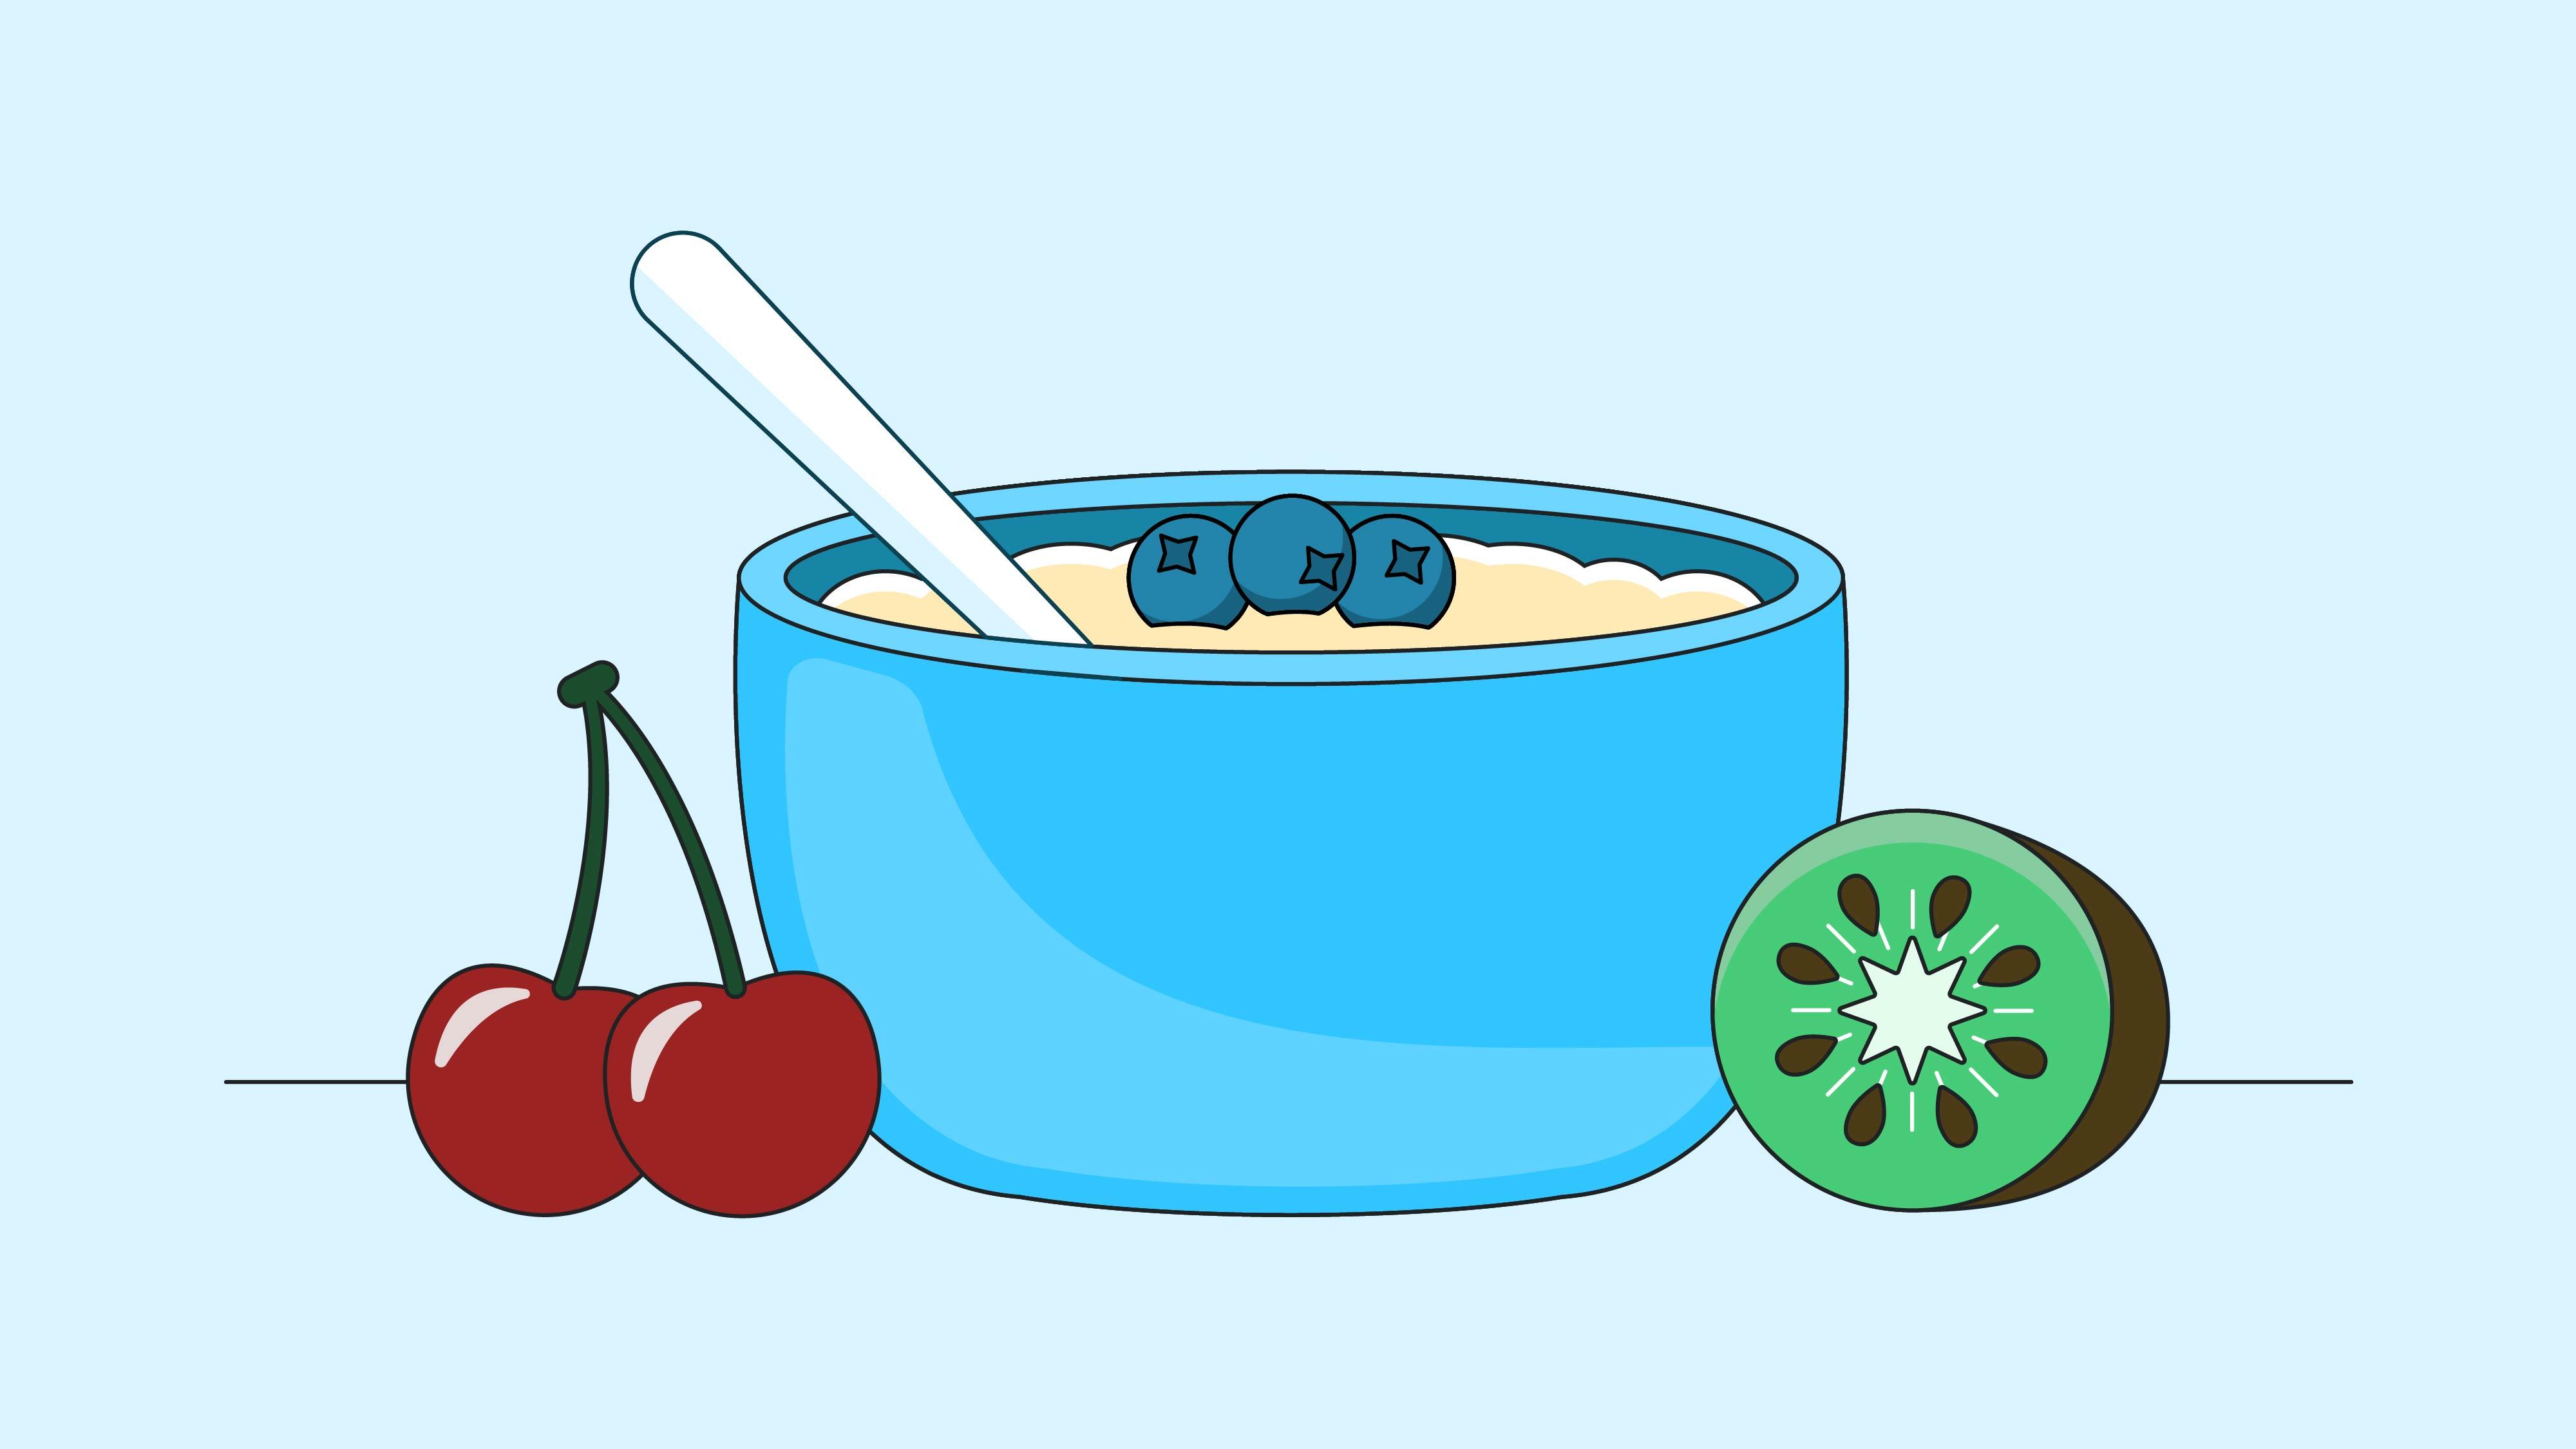 kiwi, oatmeal and tart cherry